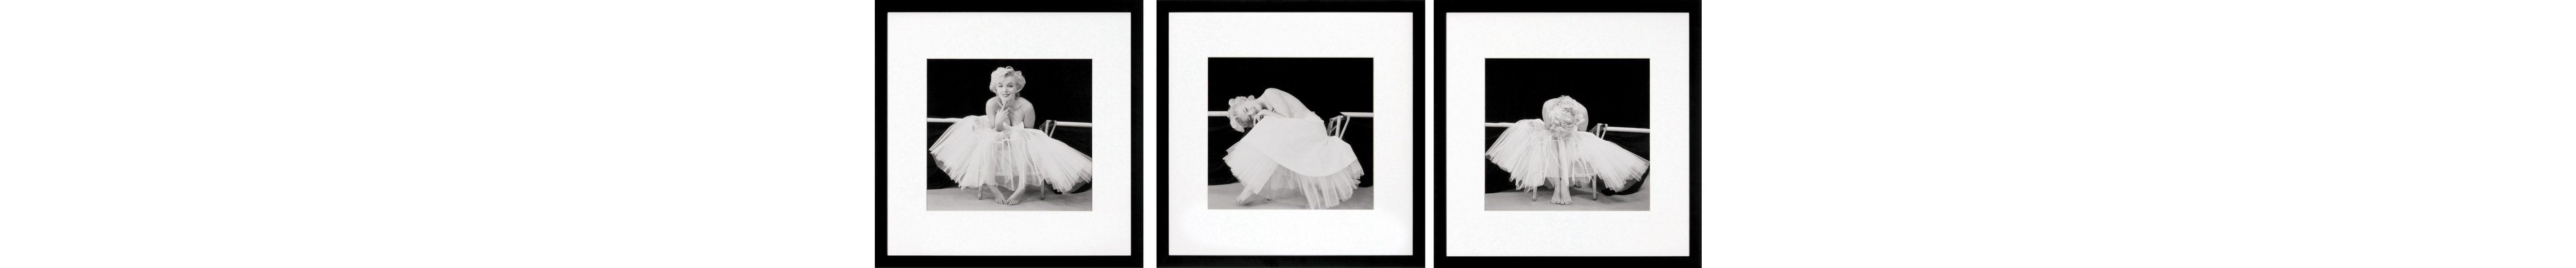 G&C gerahmte Fotografie »Marilyn Monroe Bilderset«, 3 Motive à 40/40 cm